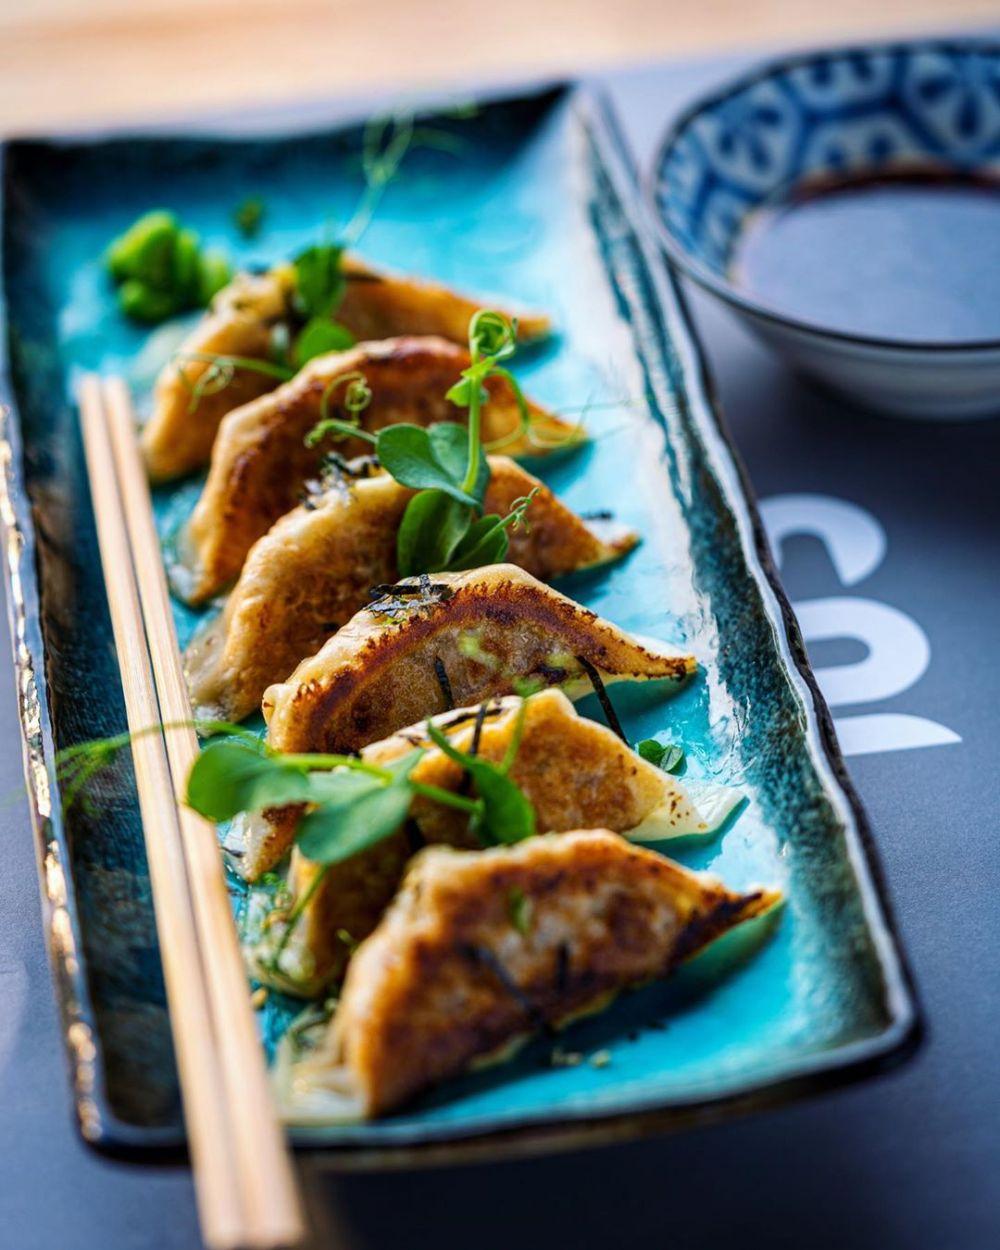 Resep camilan khas Jepang © 2020 brilio.net